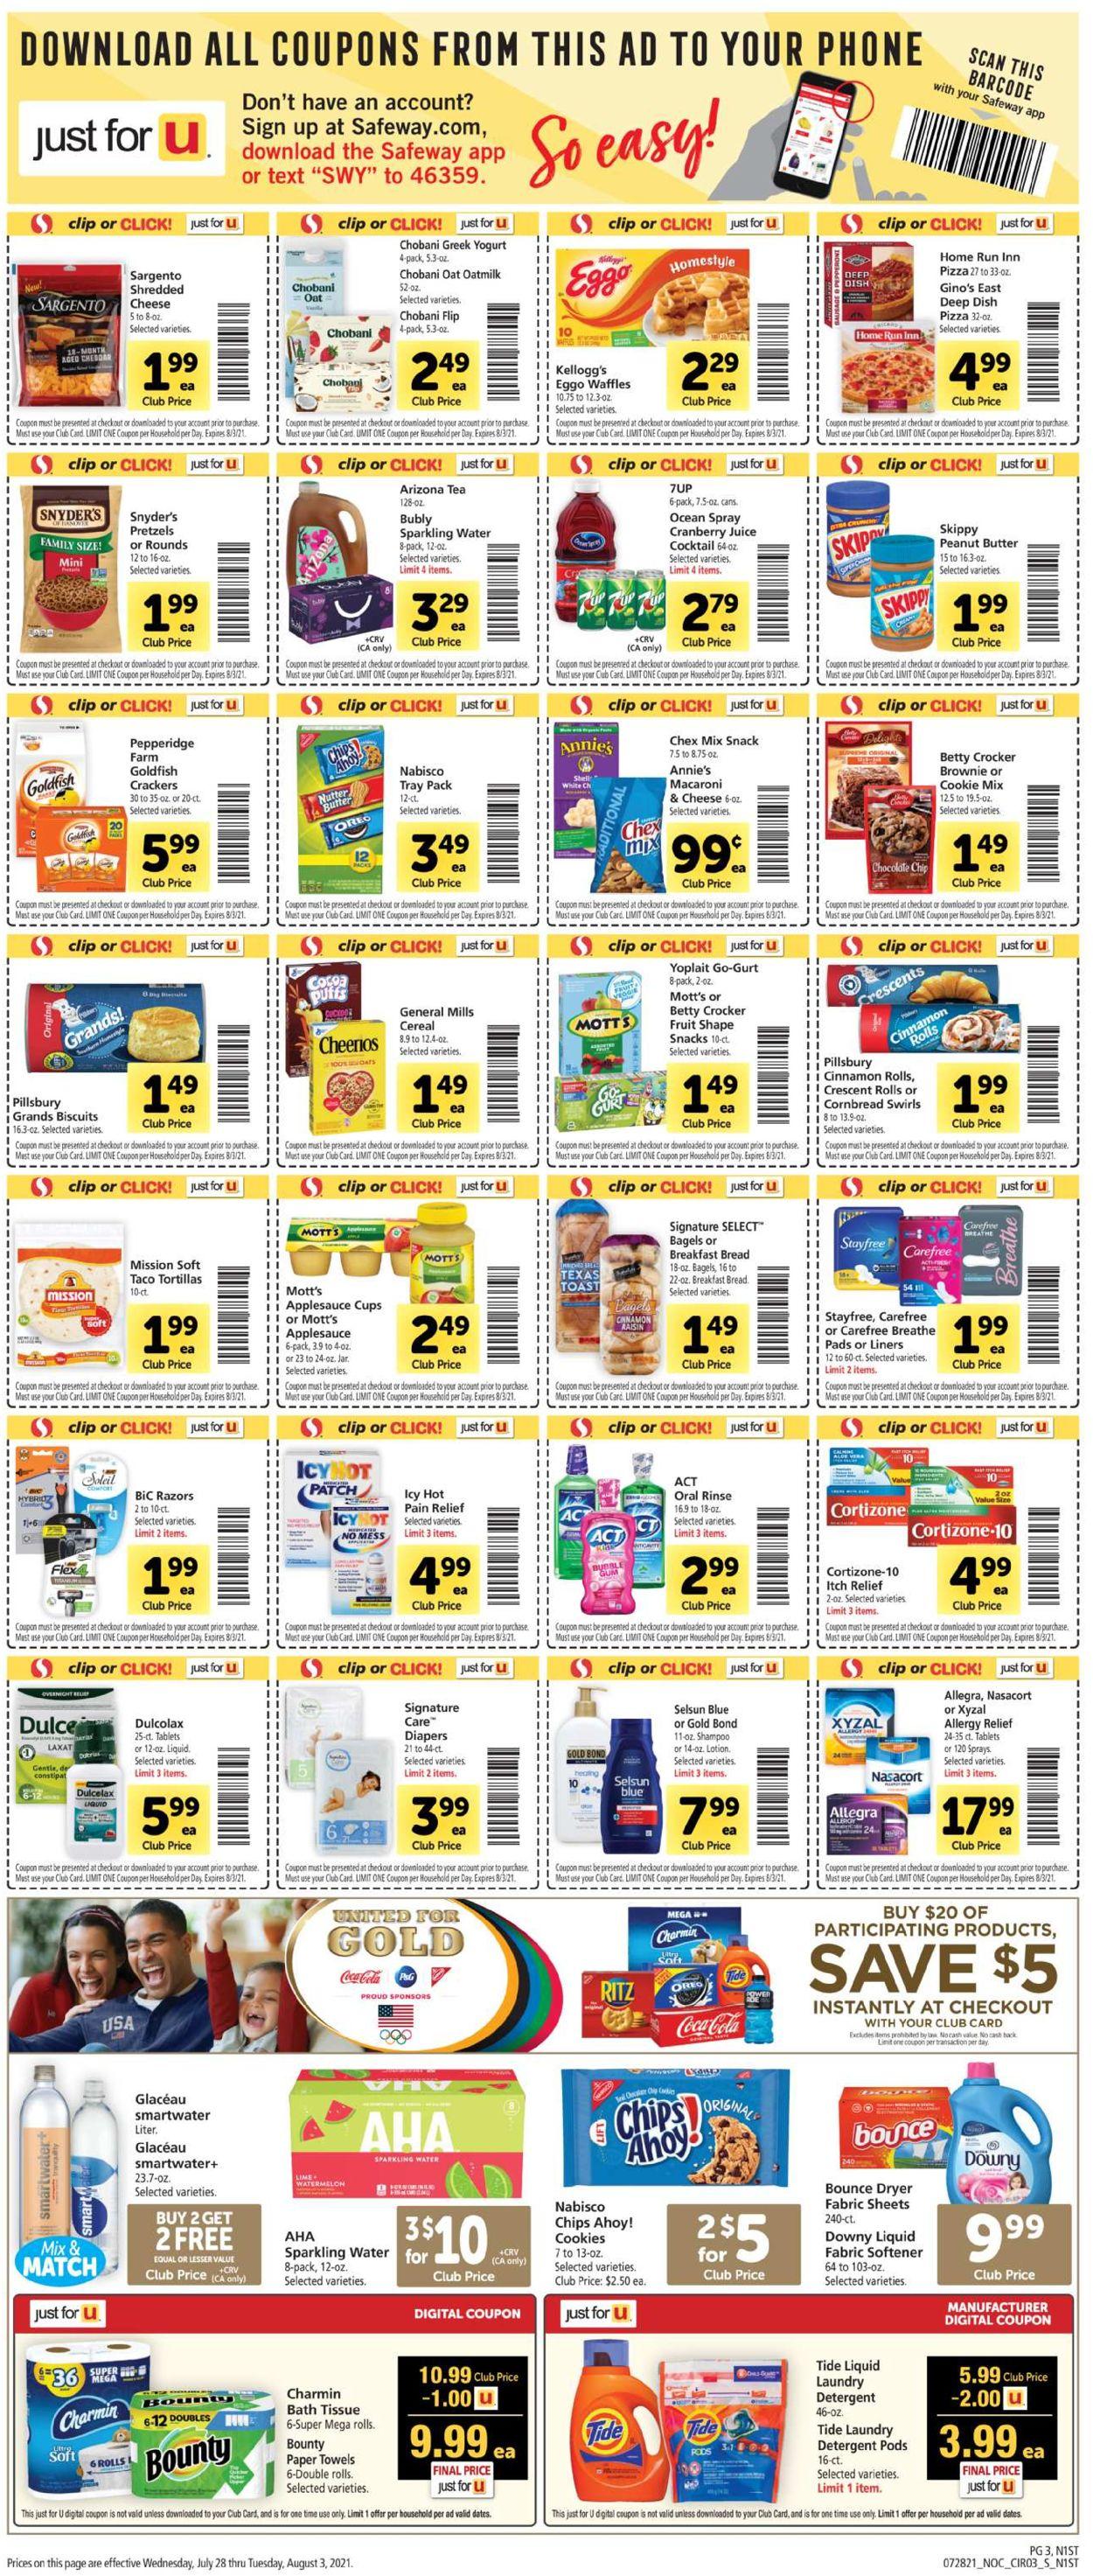 Safeway Weekly Ad Circular - valid 07/28-08/03/2021 (Page 3)